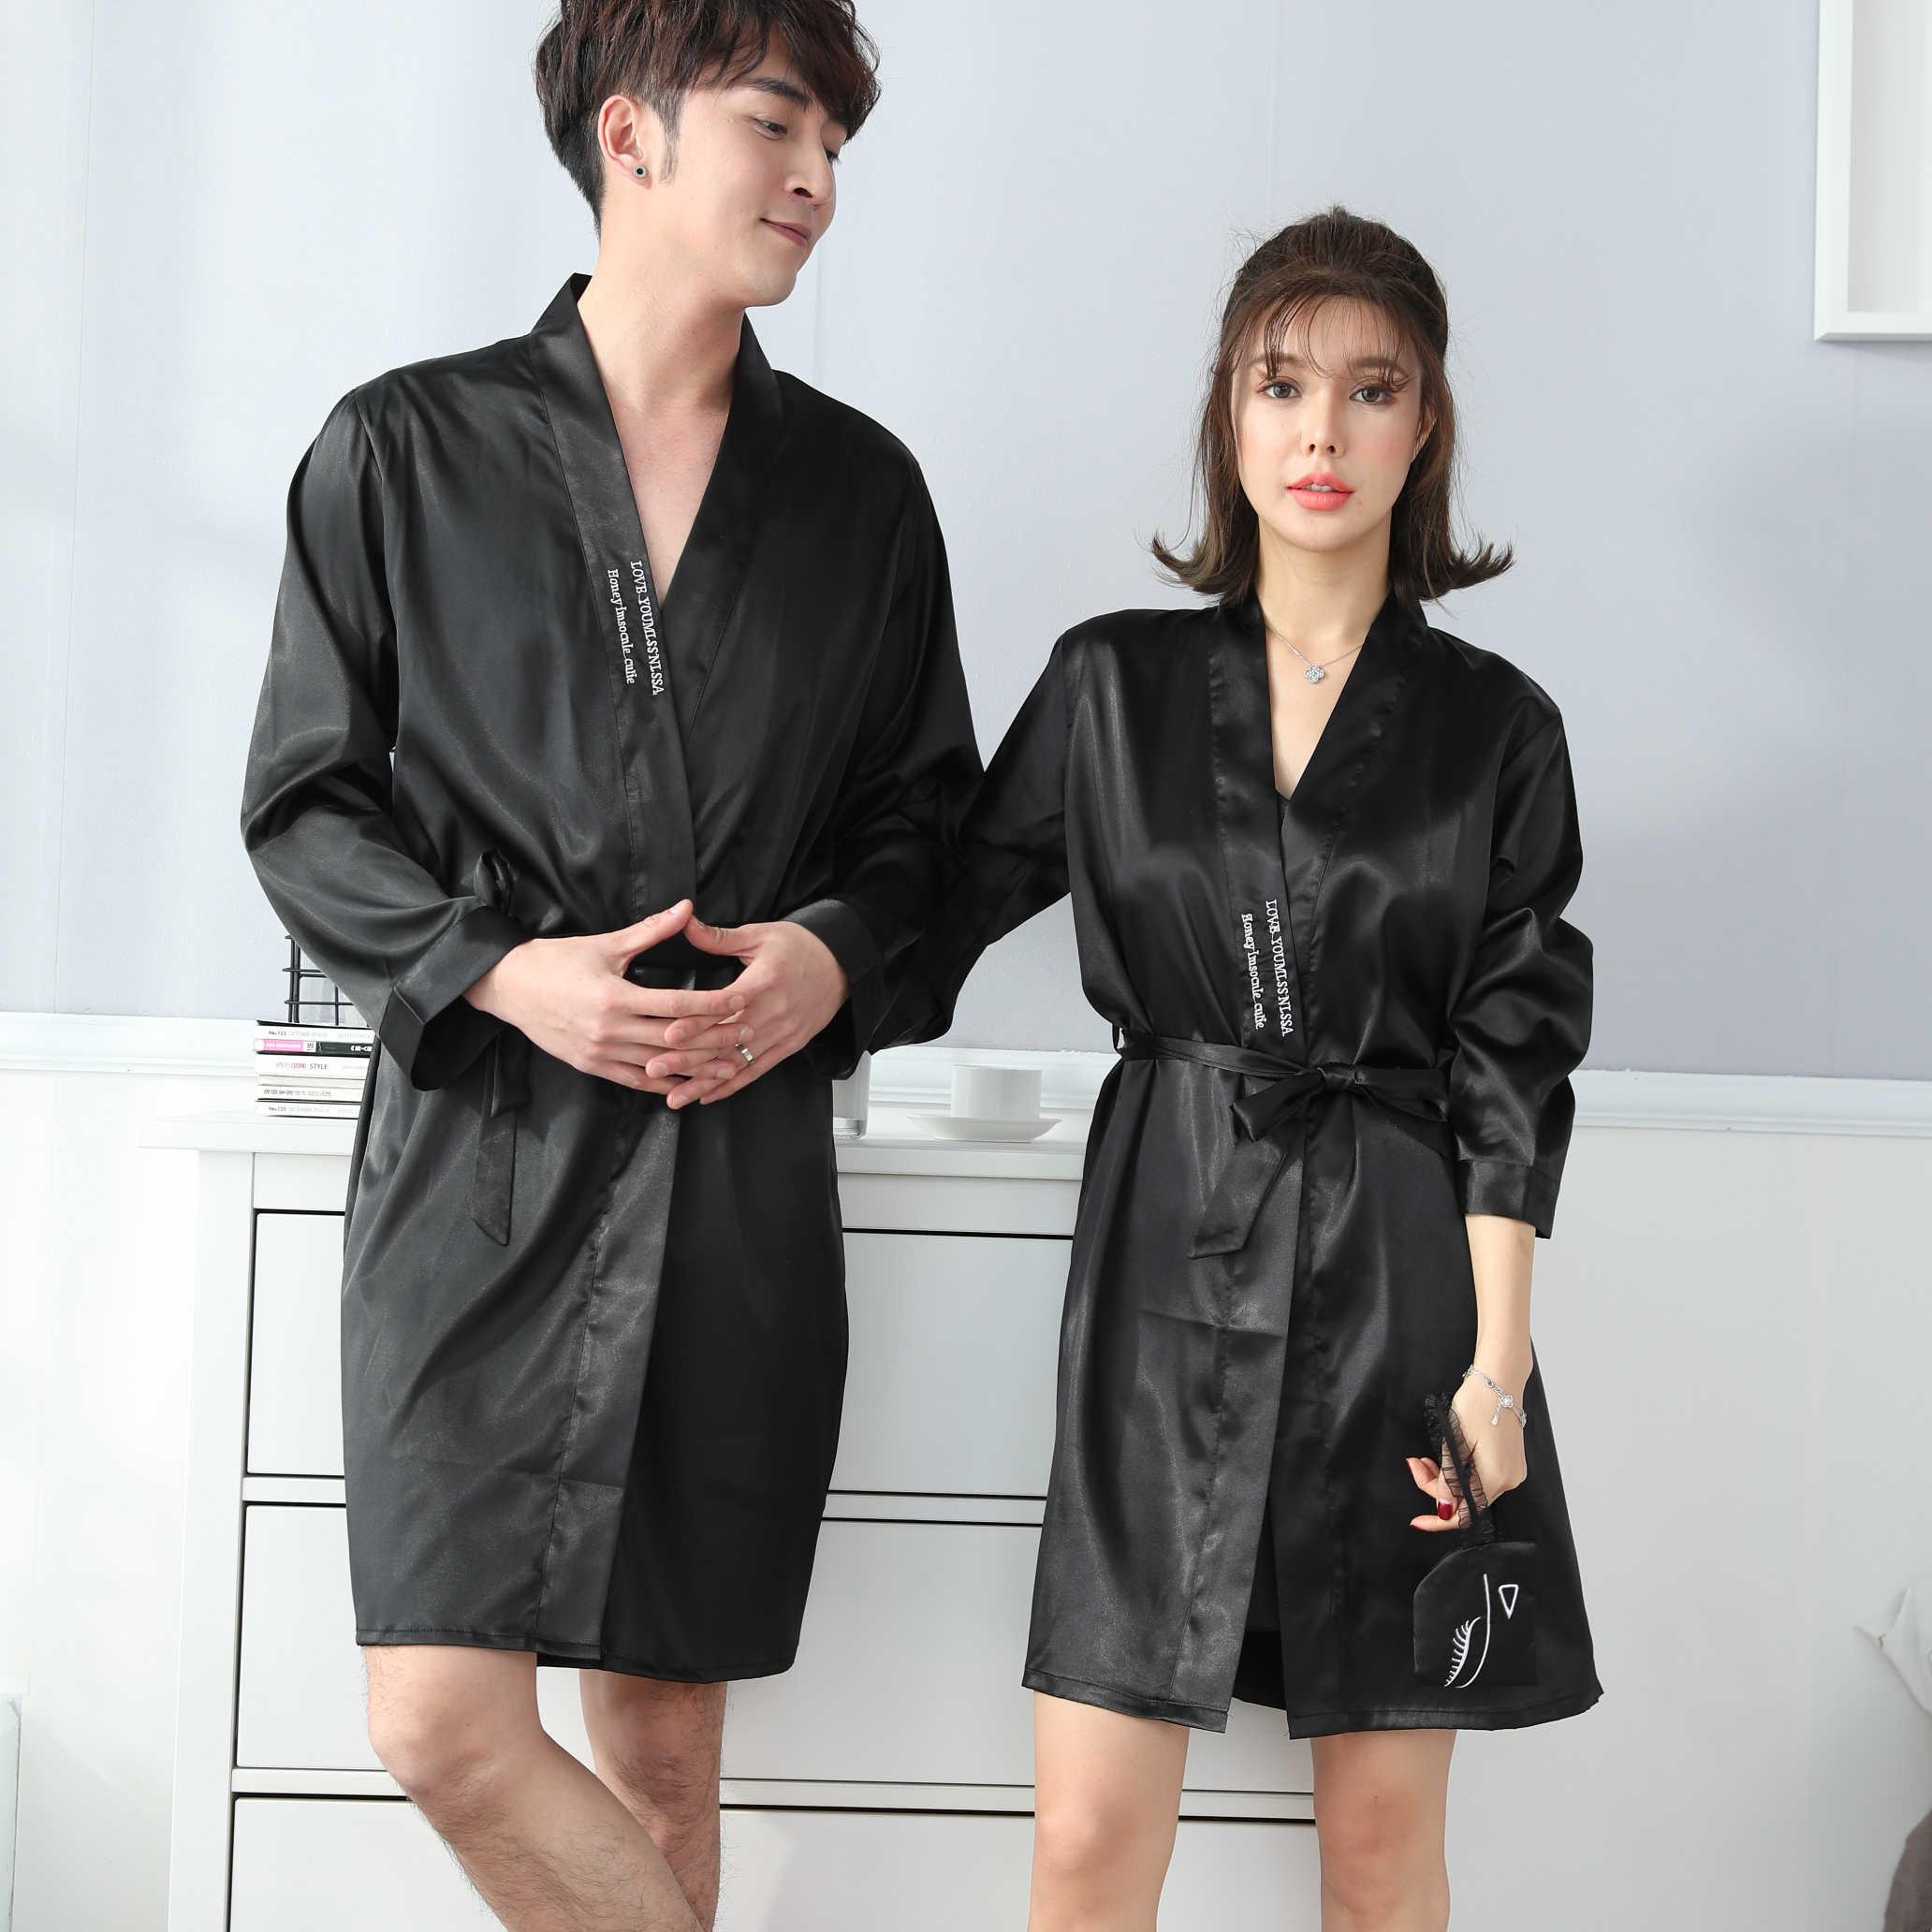 2PCS Sexy Couples Silk Satin Robe Set for Women 2019 Spring Long Sleeve Nightgown  Sleepwear Men 80b1b8546